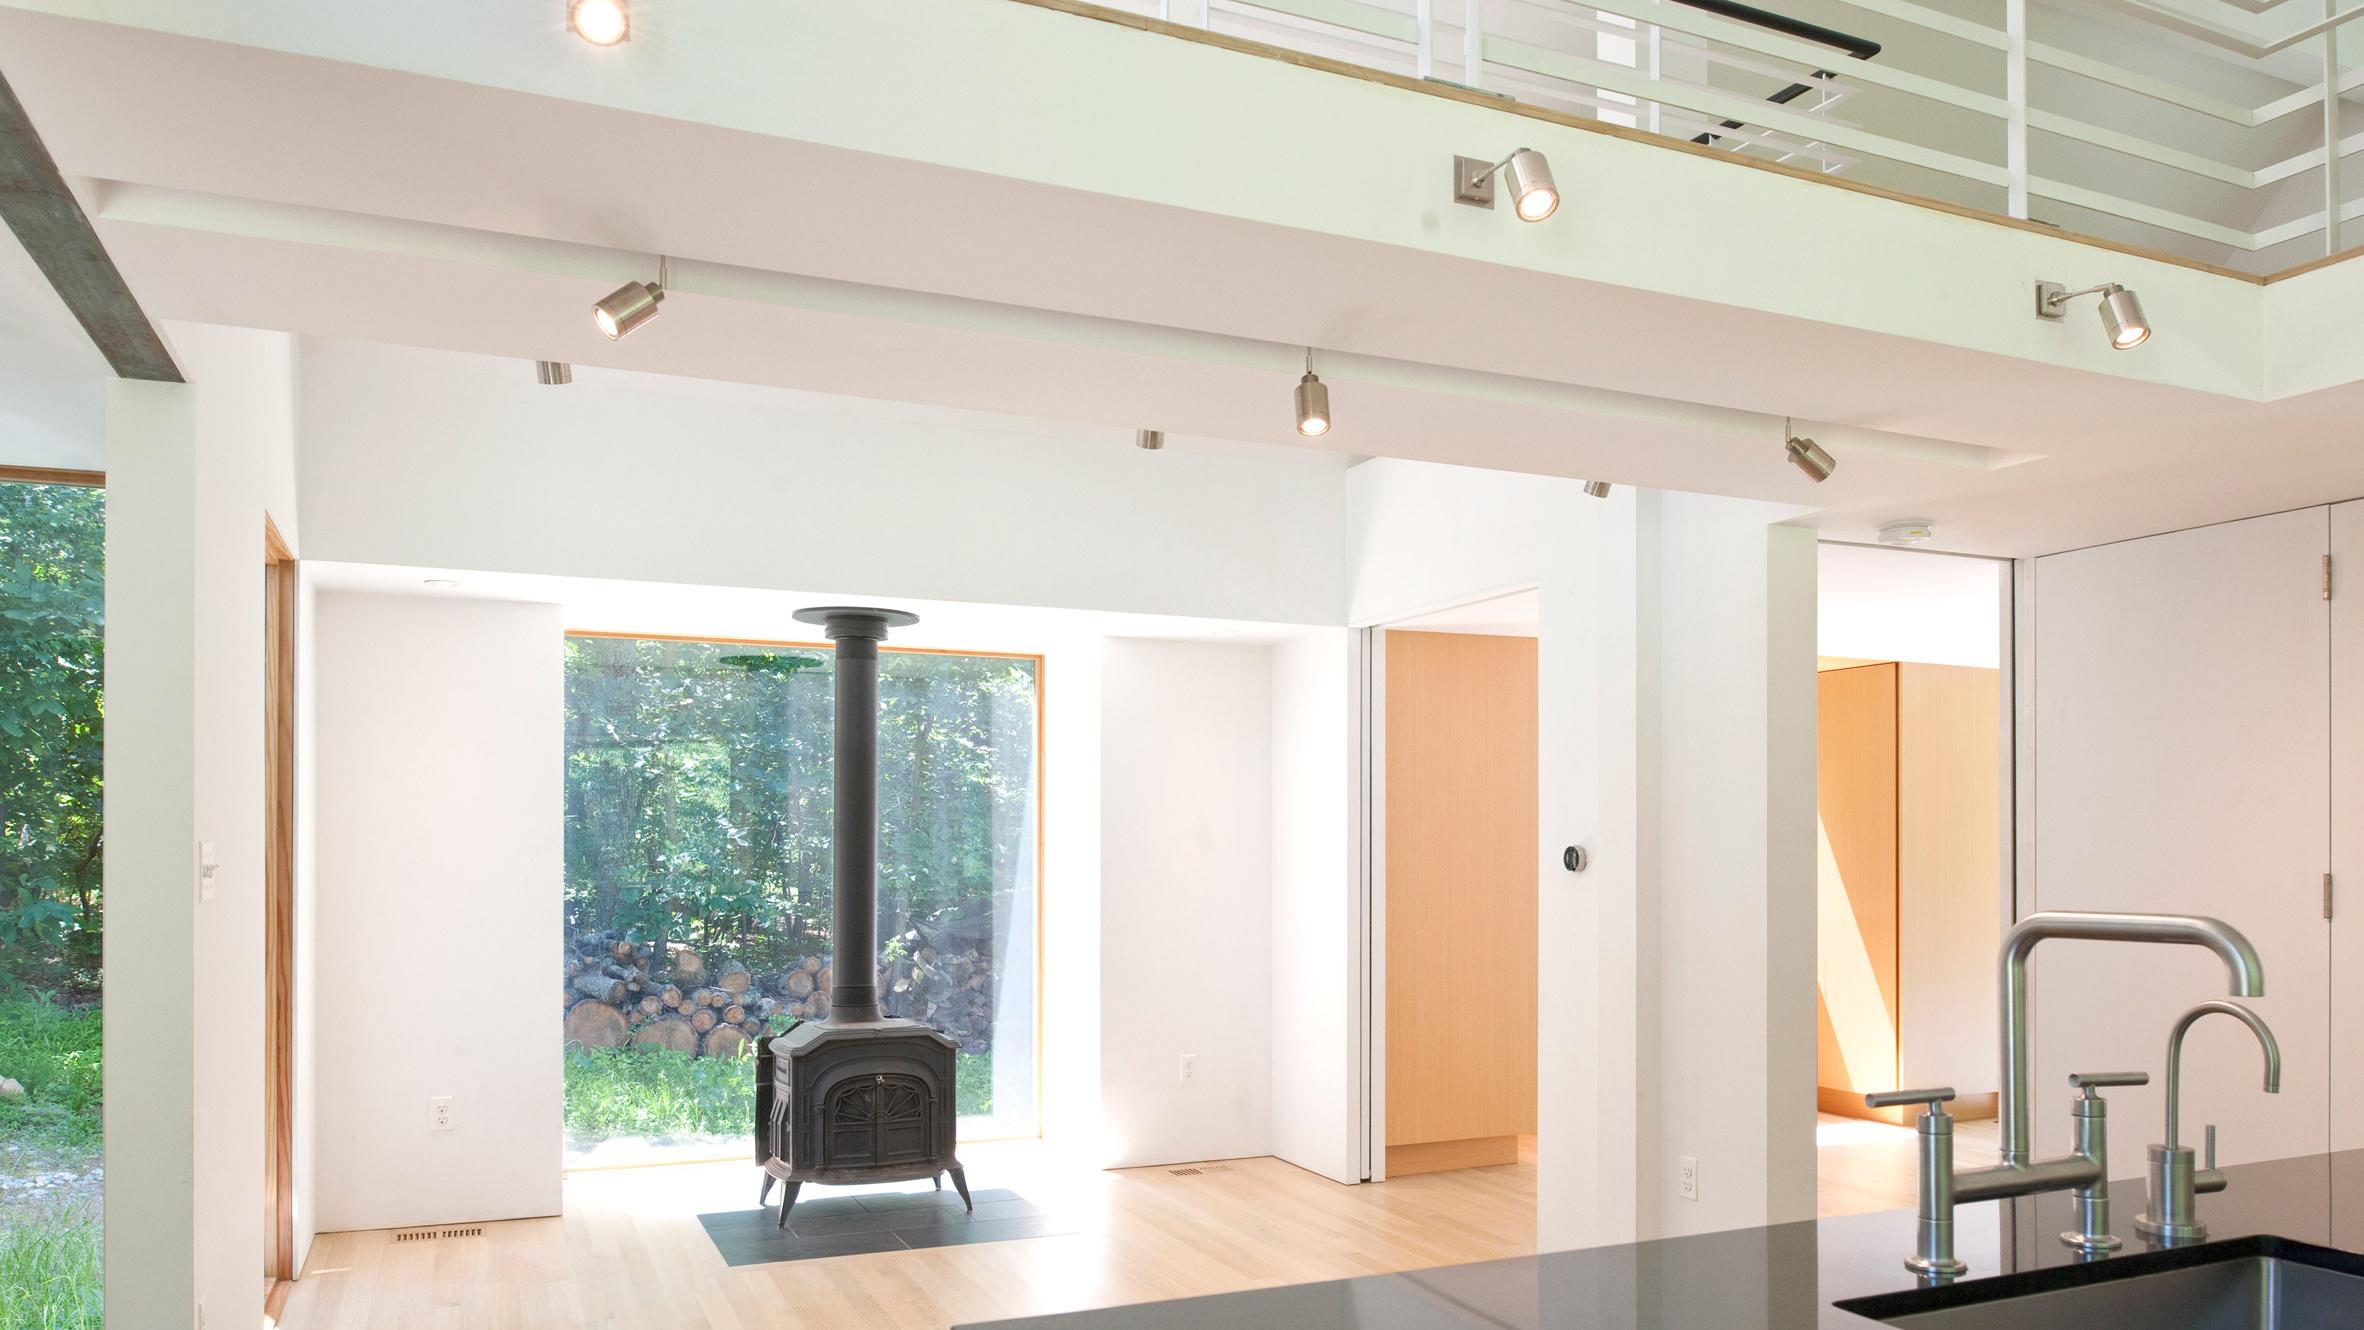 21st-century-cabin-mcinturff-architects-residential-architecture-maryland-usa_dezeen_2364_hero